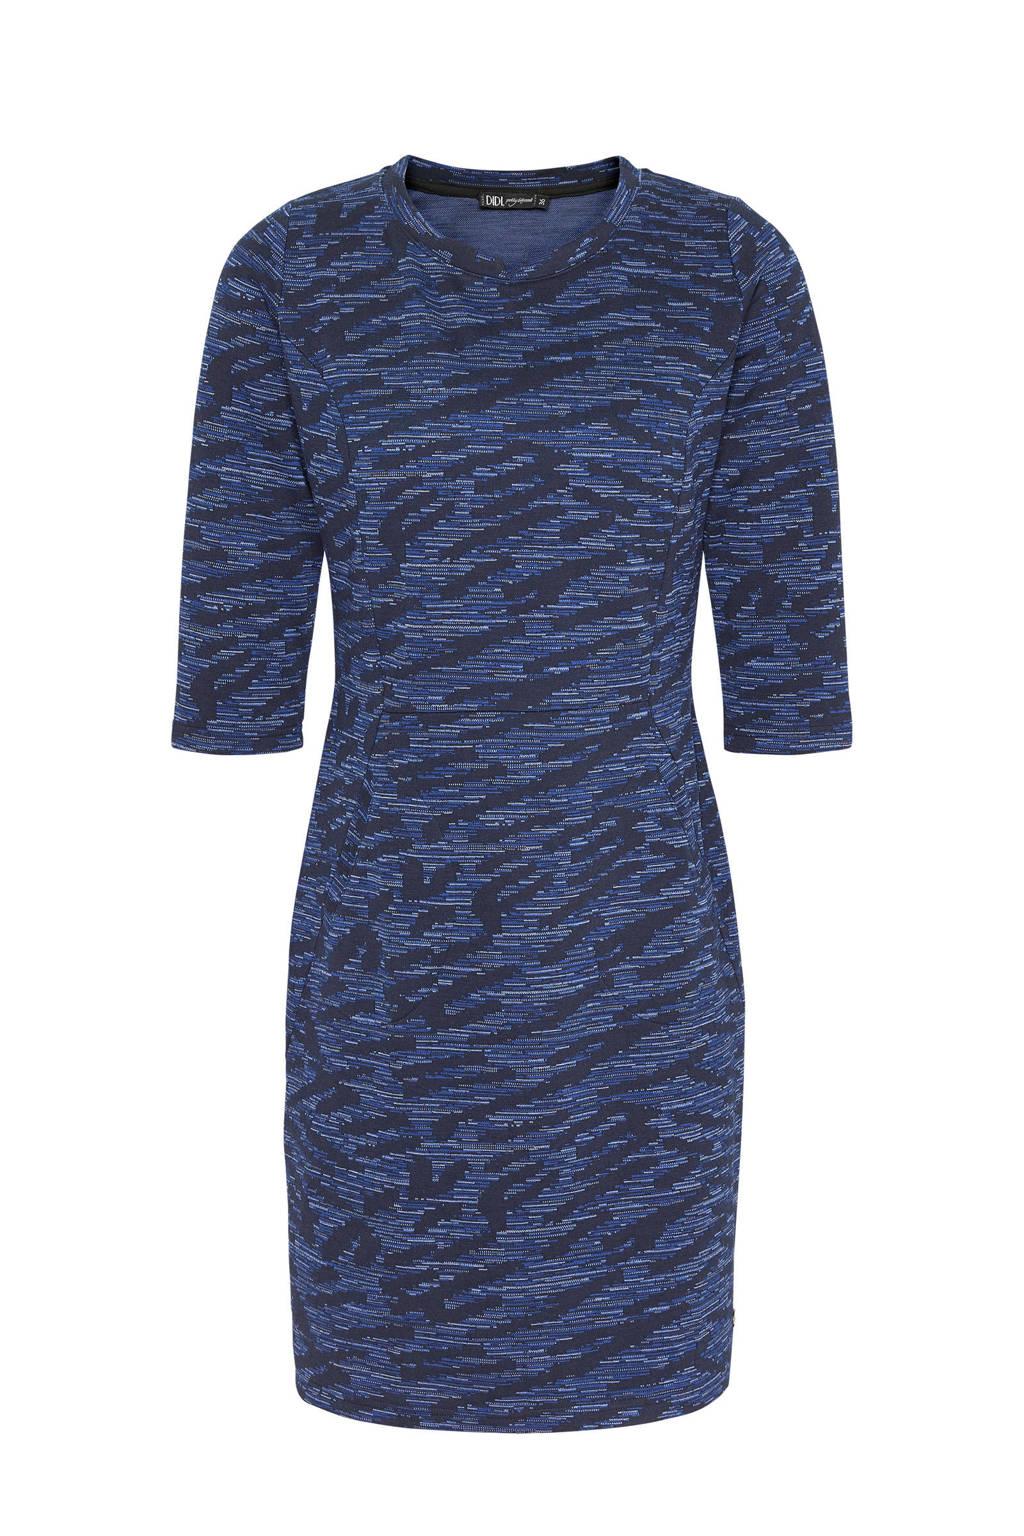 Didi jurk met all over print, Donkerblauw